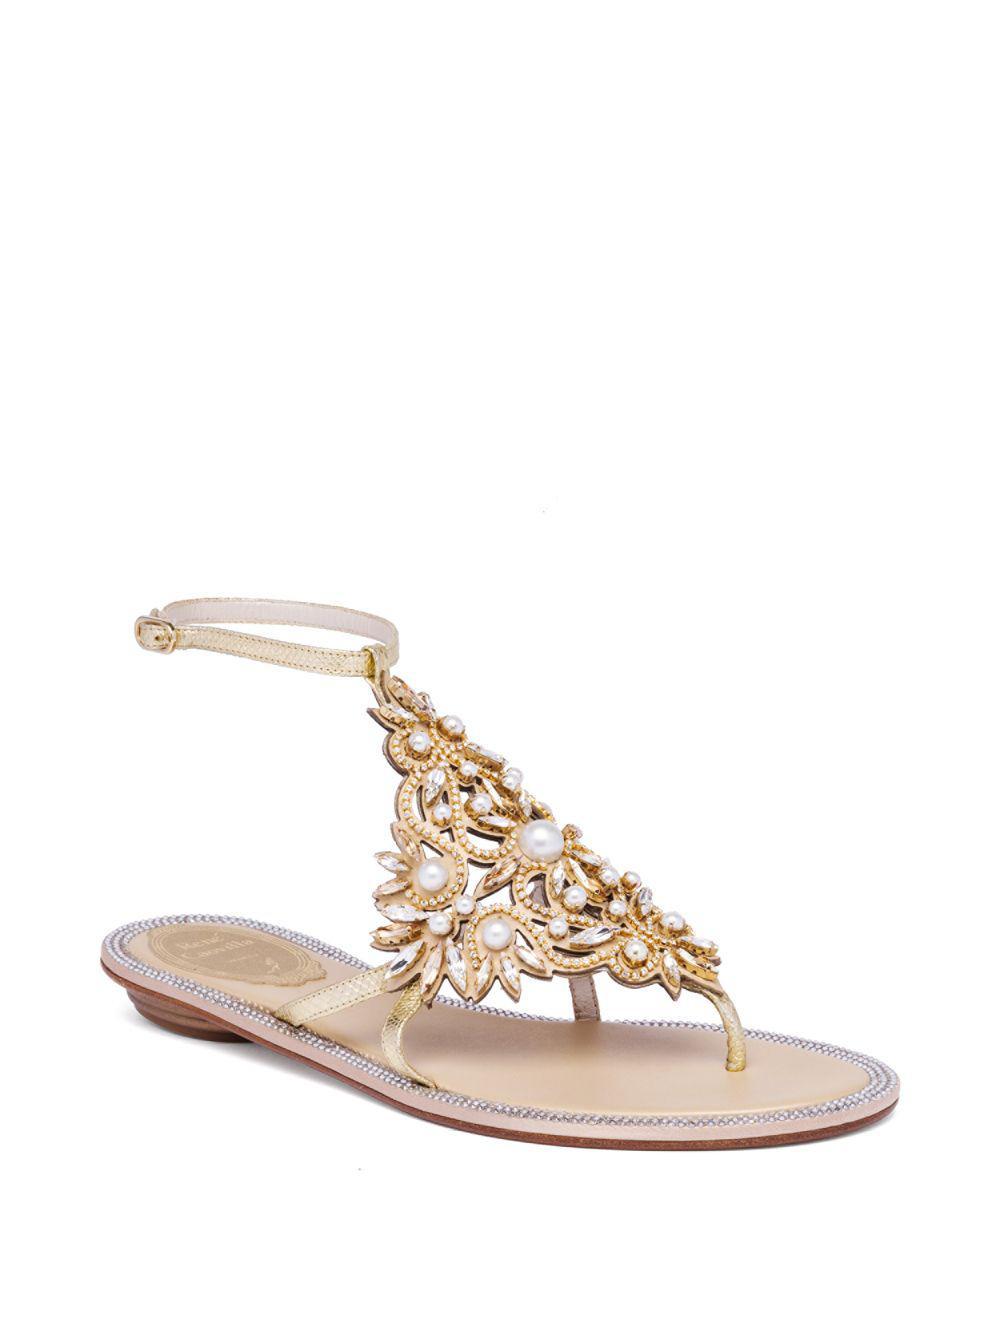 93483cd1ff4ab Lyst - Rene Caovilla Embellished Metallic Sandals in Metallic